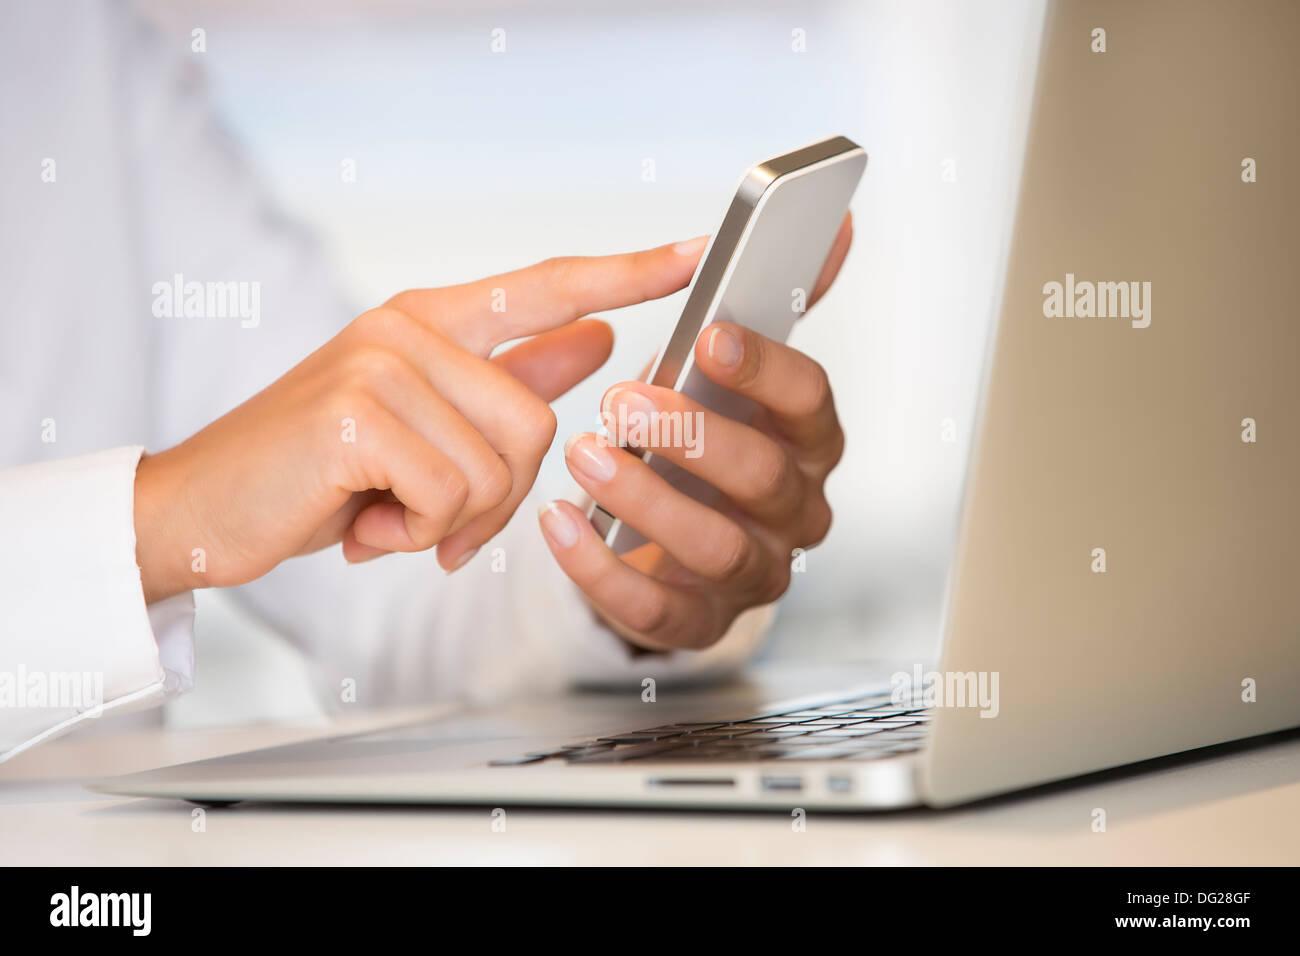 Female laptop cell phone finger table desk indoor - Stock Image